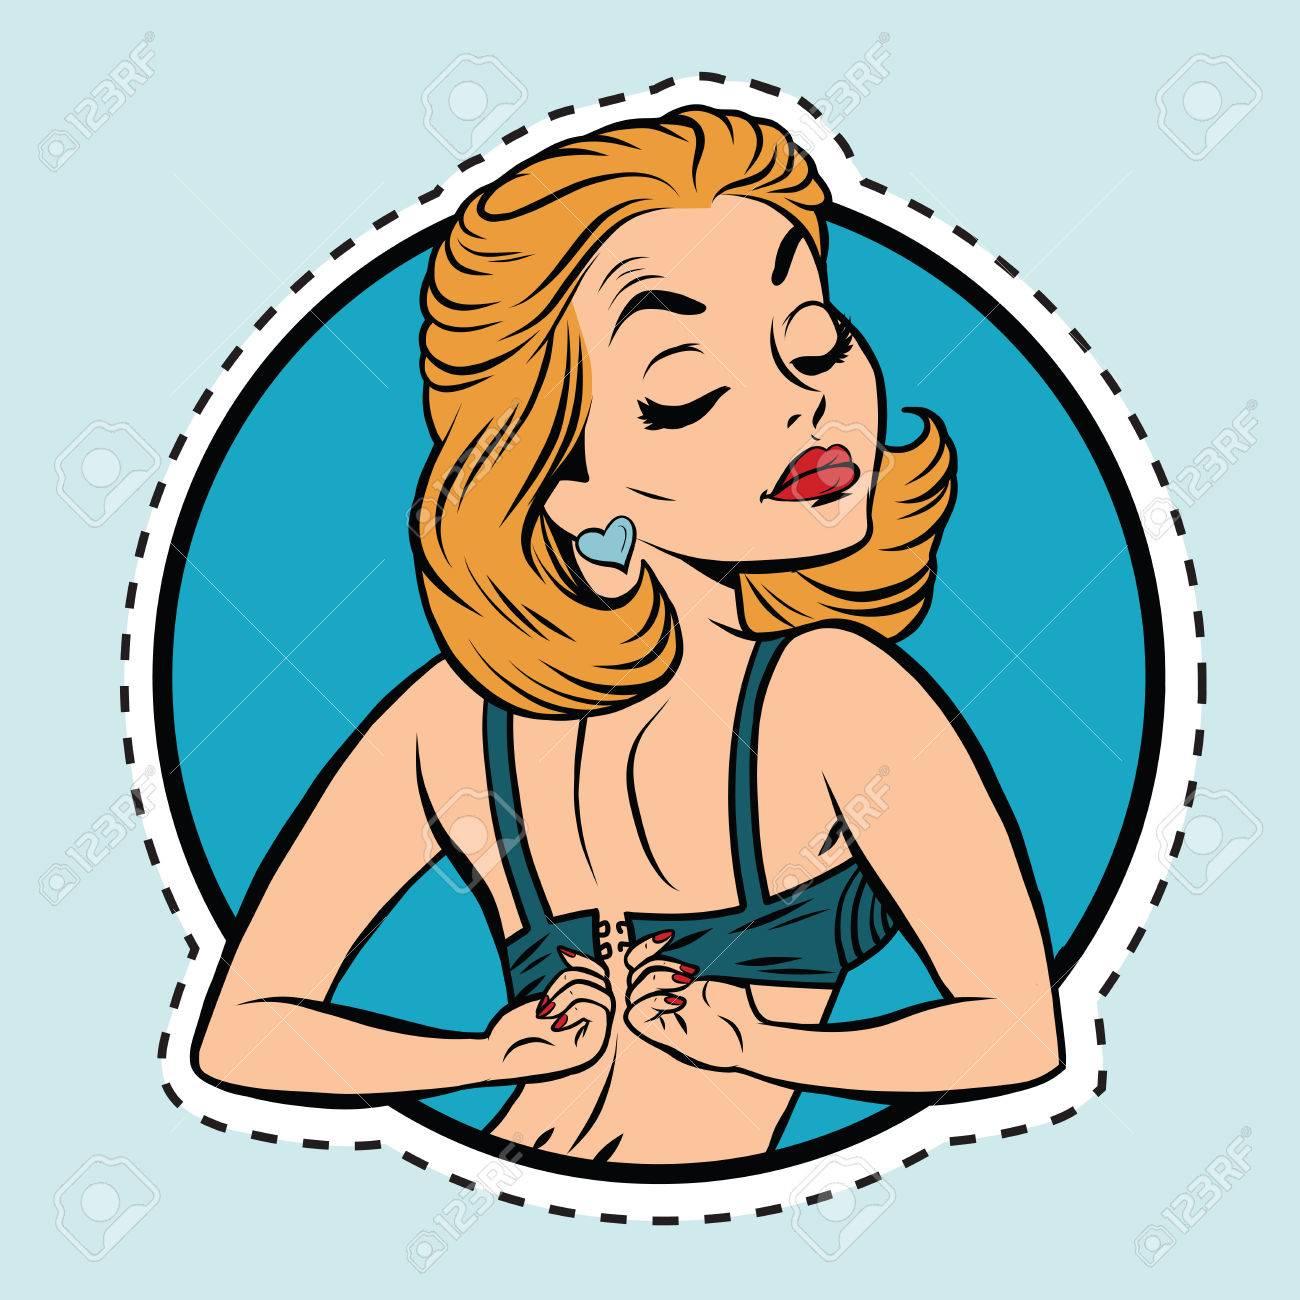 Pin-up girl wears a bra, pop art comic illustration. Label sticker cutting contour - 64450212